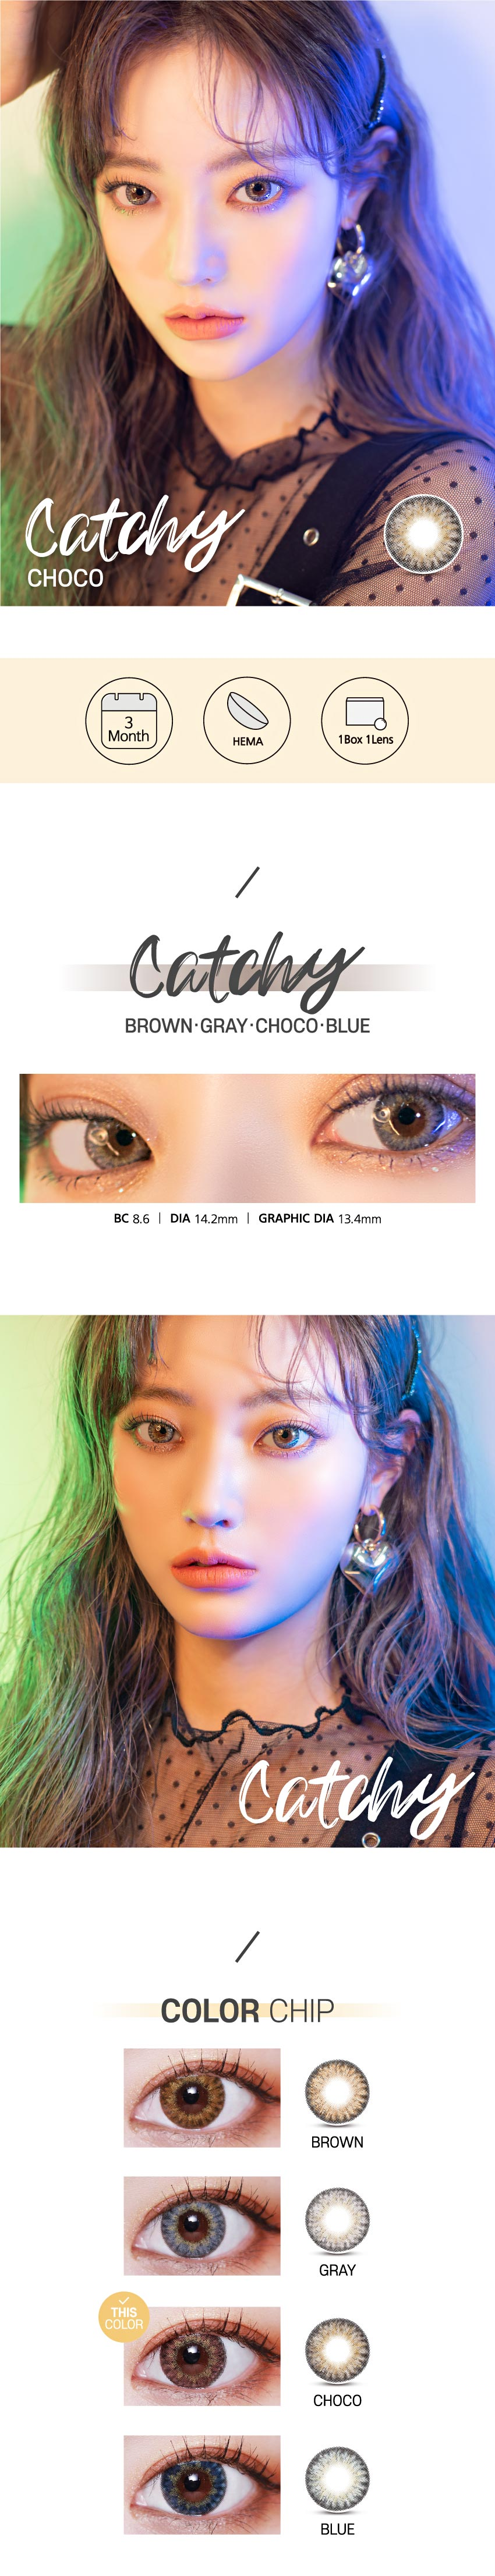 catchy-choco-korean-lenses-2222.jpg